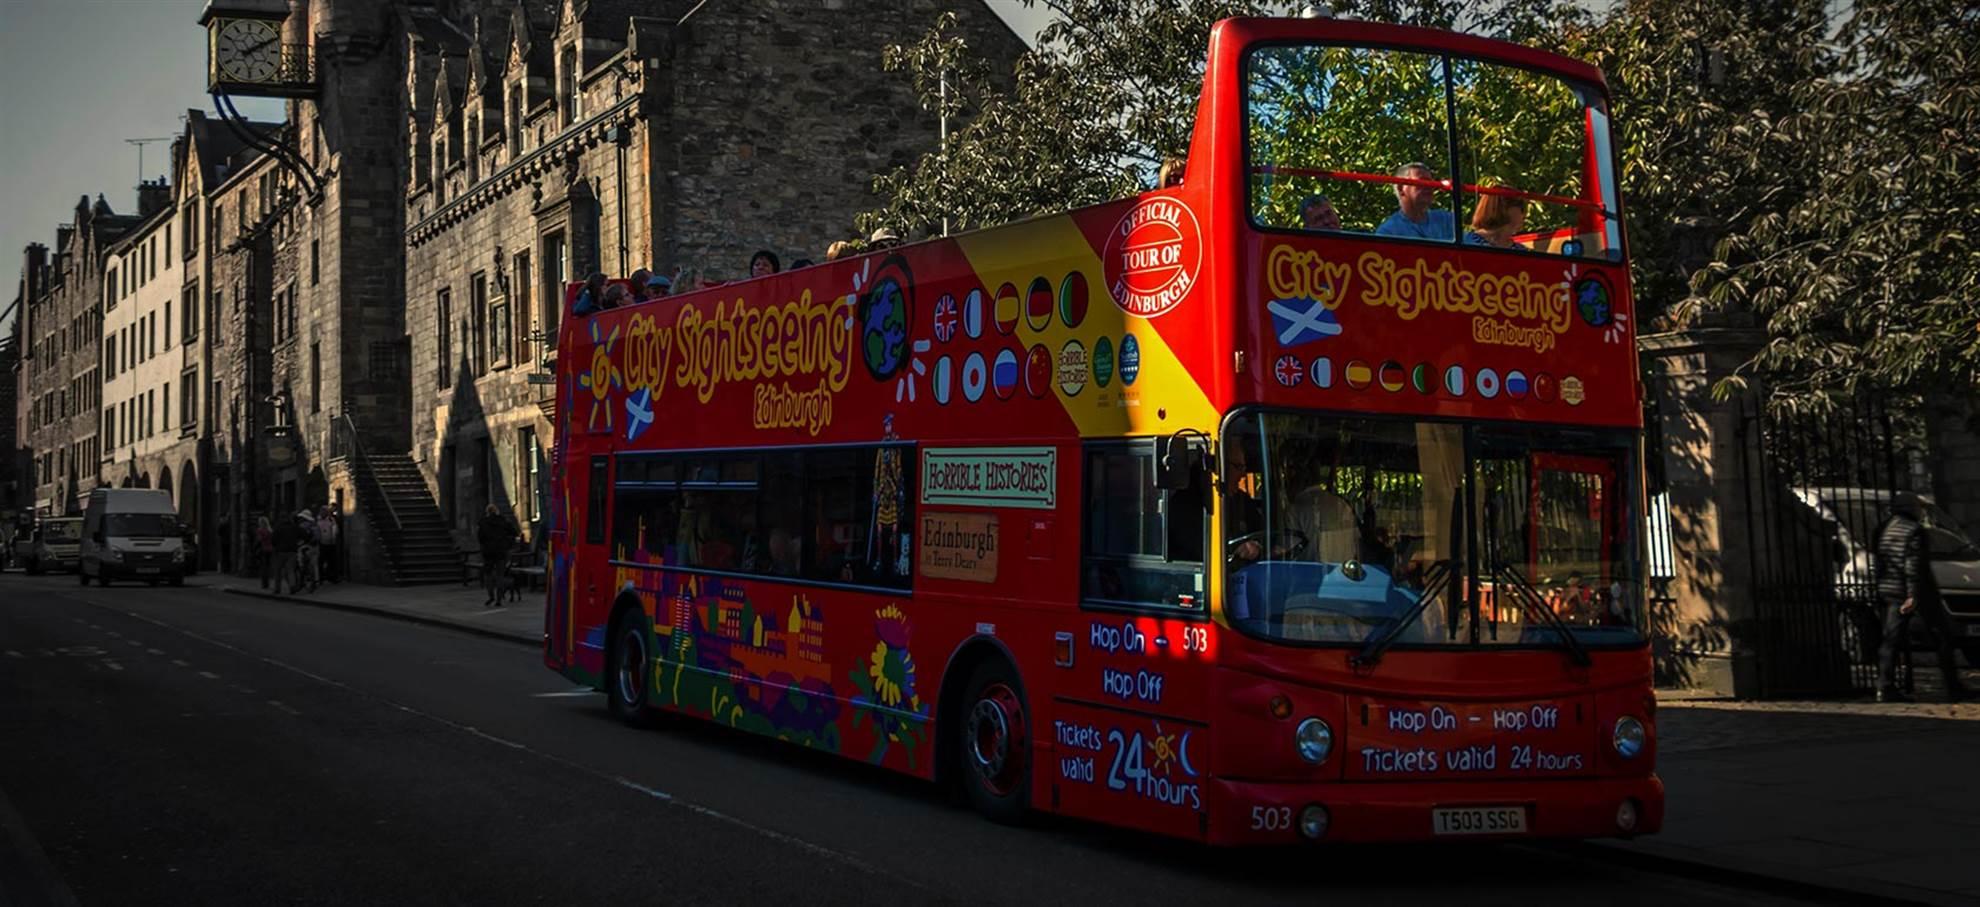 Edinburgh Hop on Hop off Bus